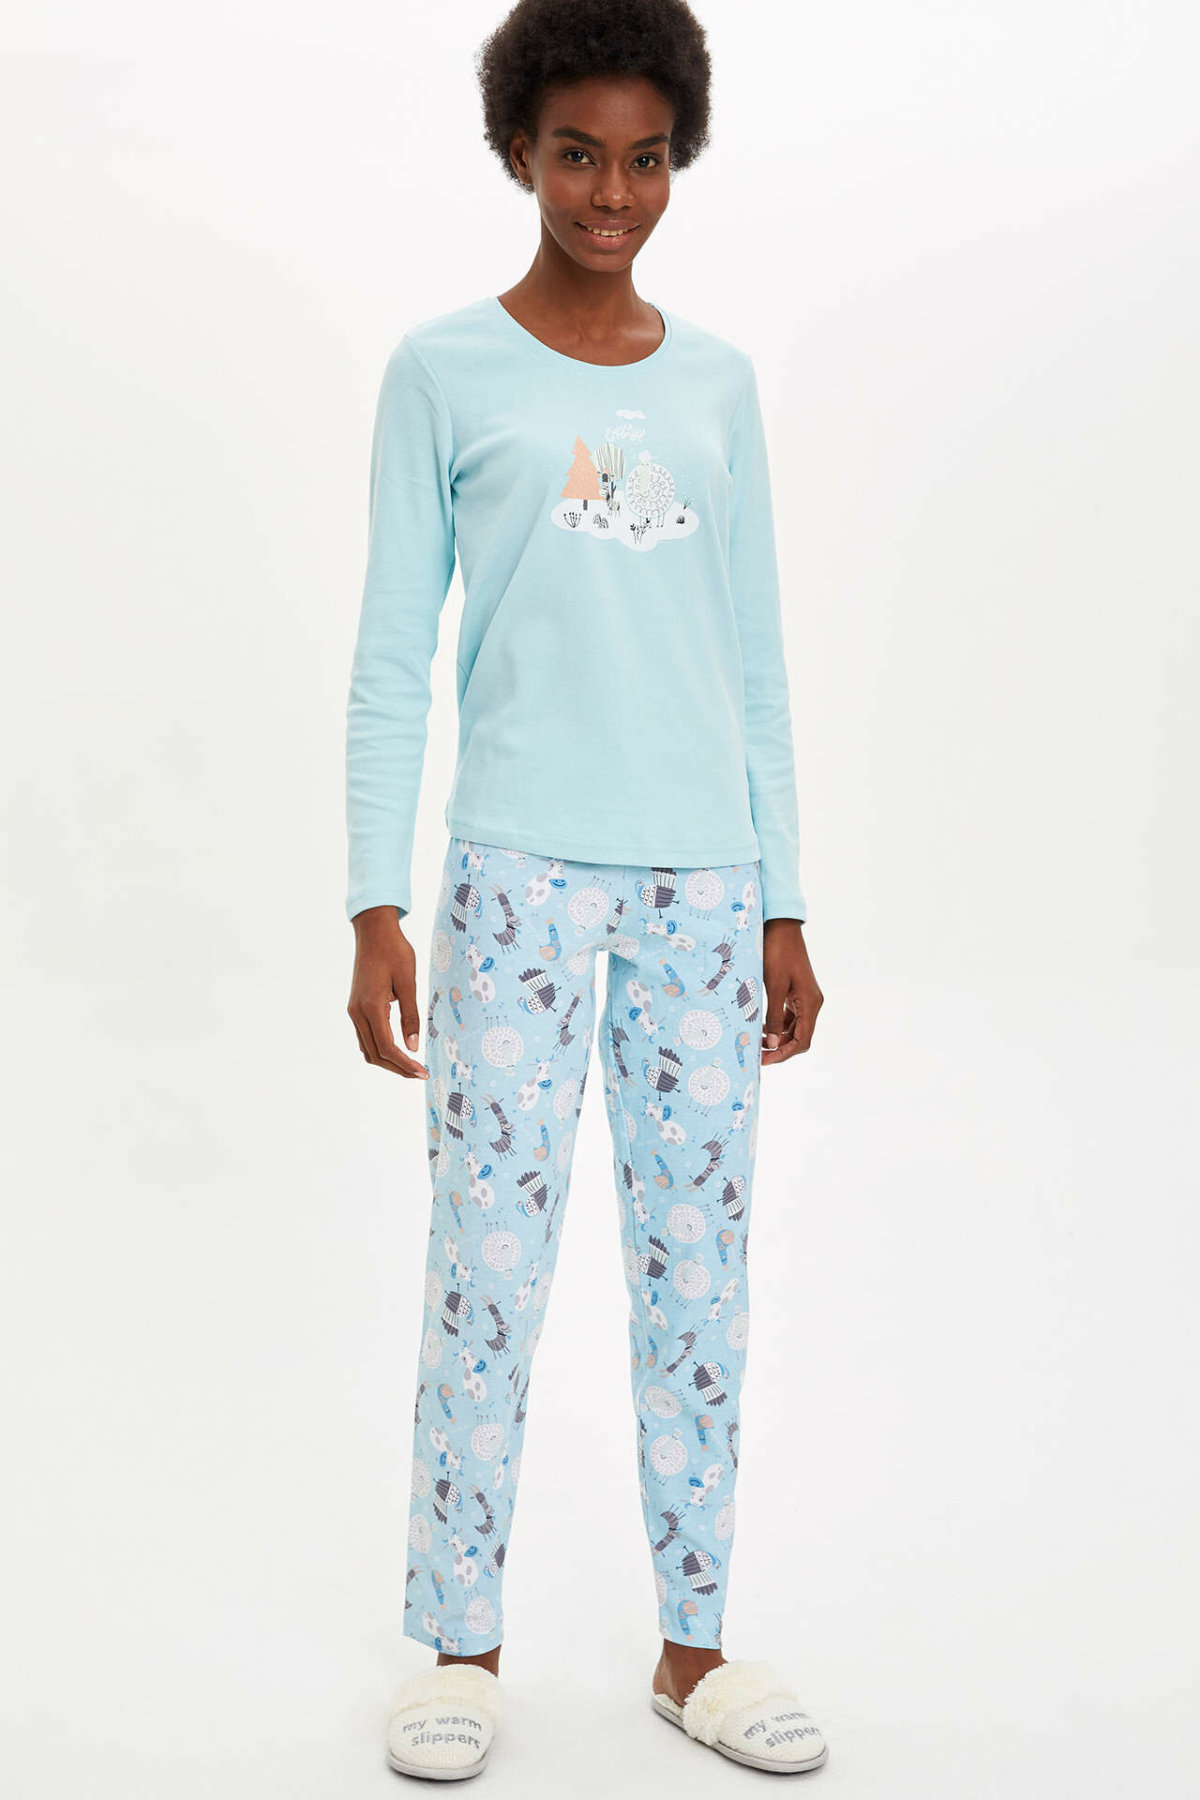 DeFacto Woman Pink Blue Winter Pajamas Set Women Casual Homewear Knitted Sets Women Top & Bottoms-M8657AZ19WN